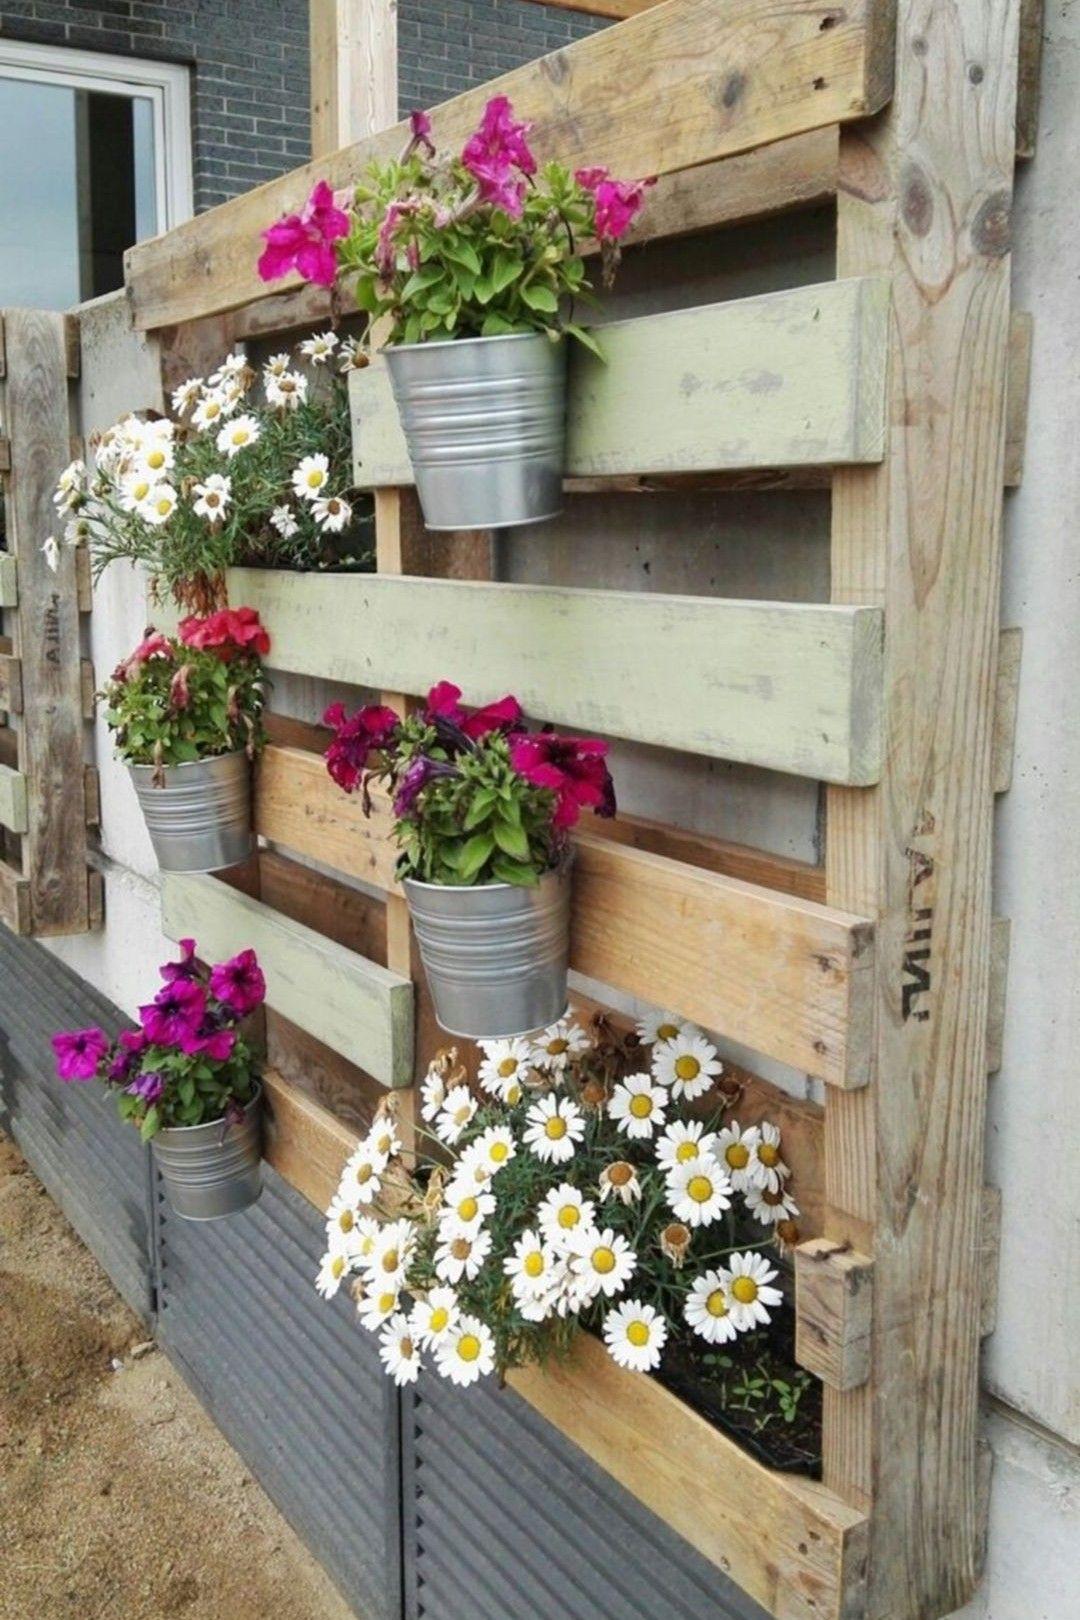 35+ Awesome Vegetable Garden Design Ideas in 2020 ...